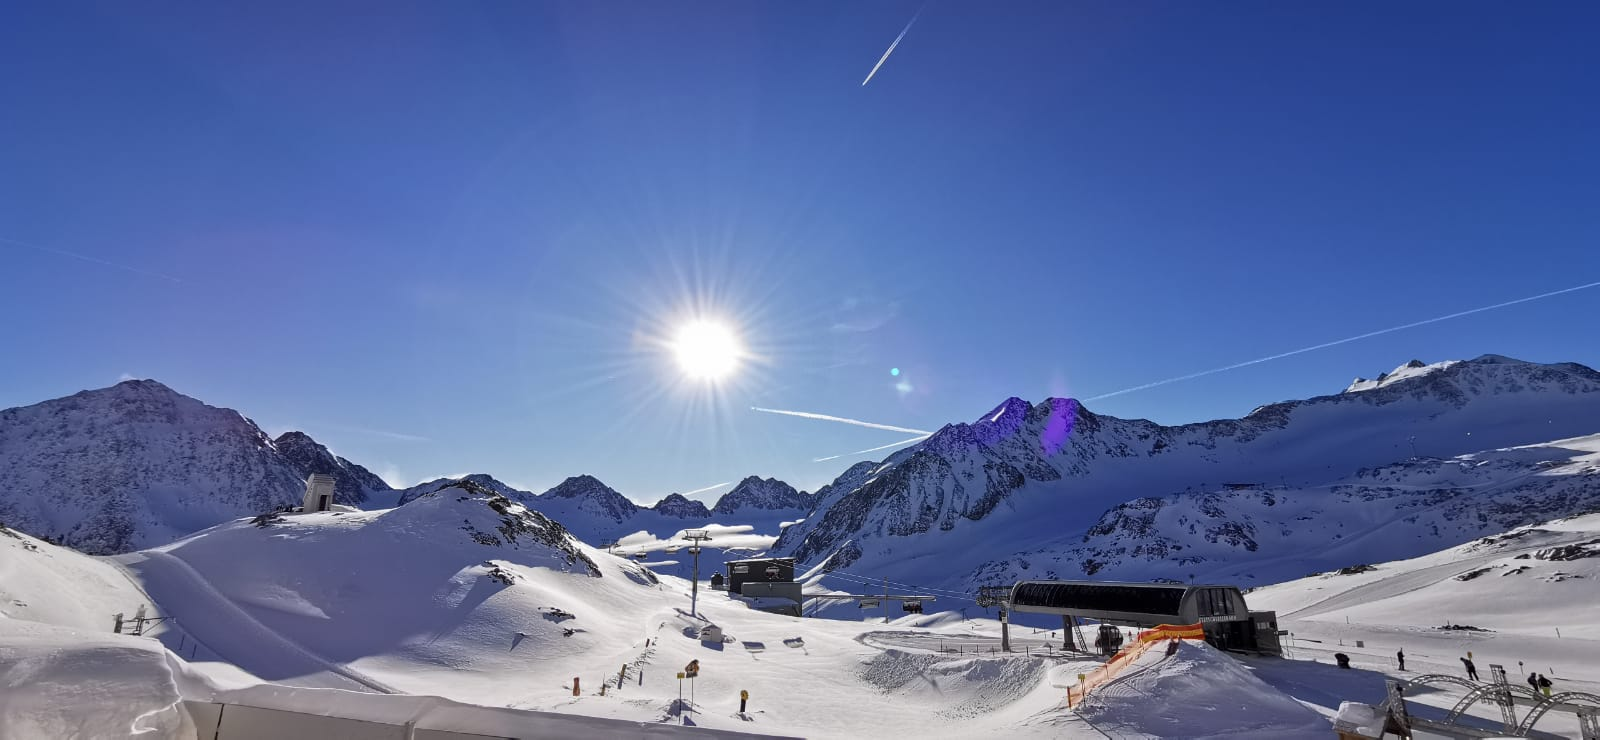 Pitztal Glacier Resort